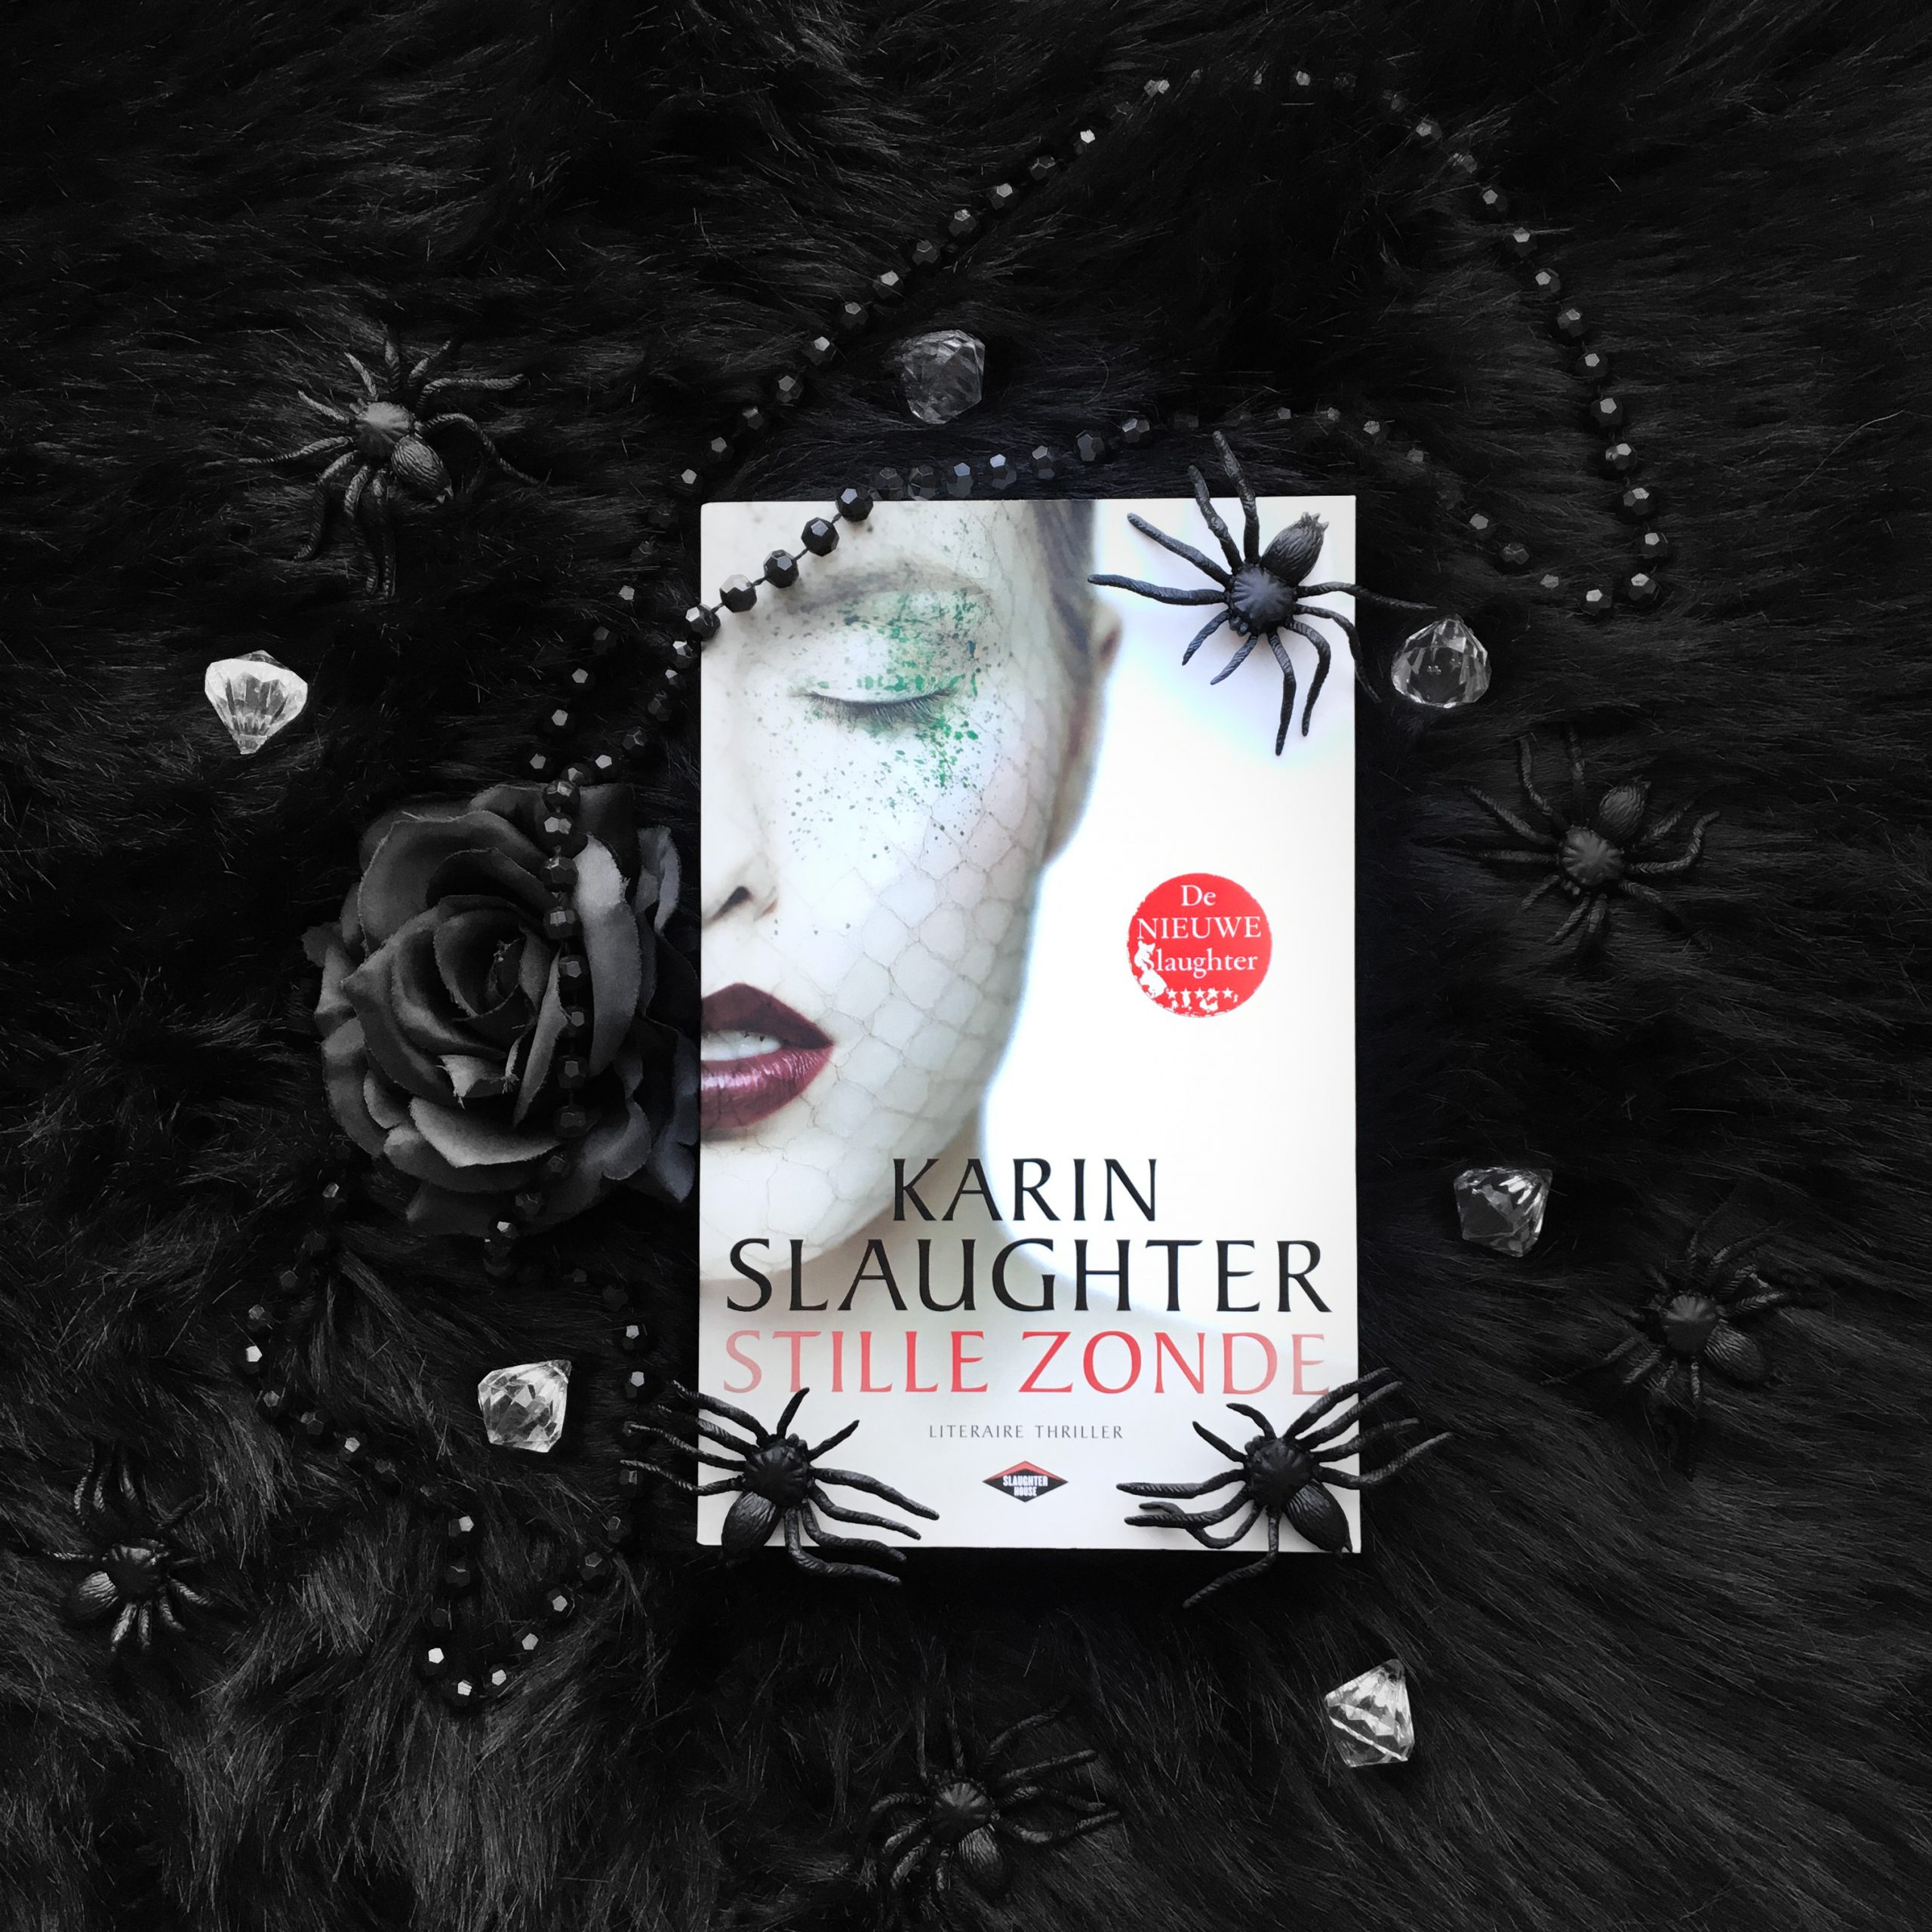 Stille zonde – Karin Slaughter